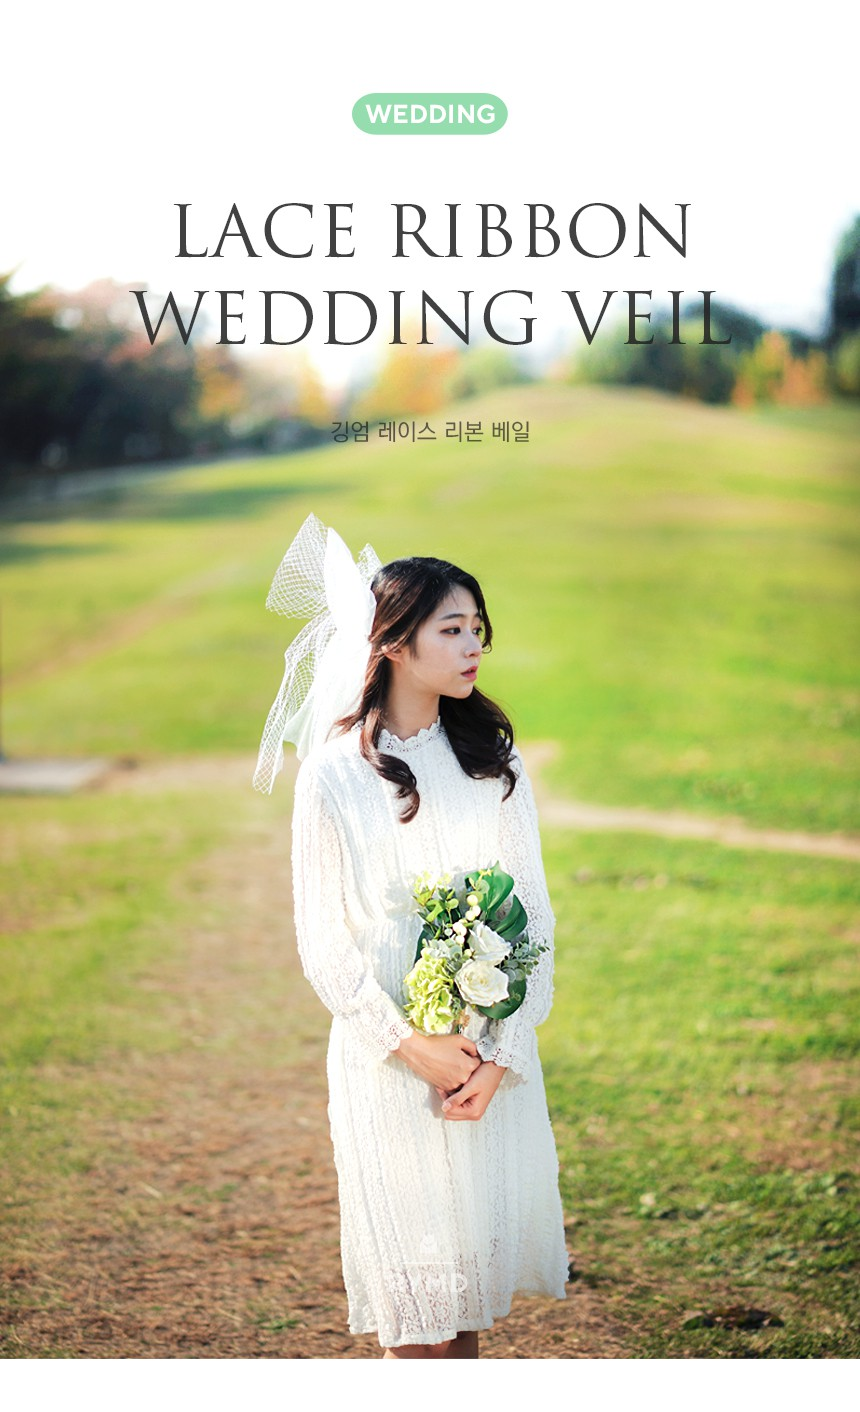 Gingham_lace_ribbon_veil (1).jpg